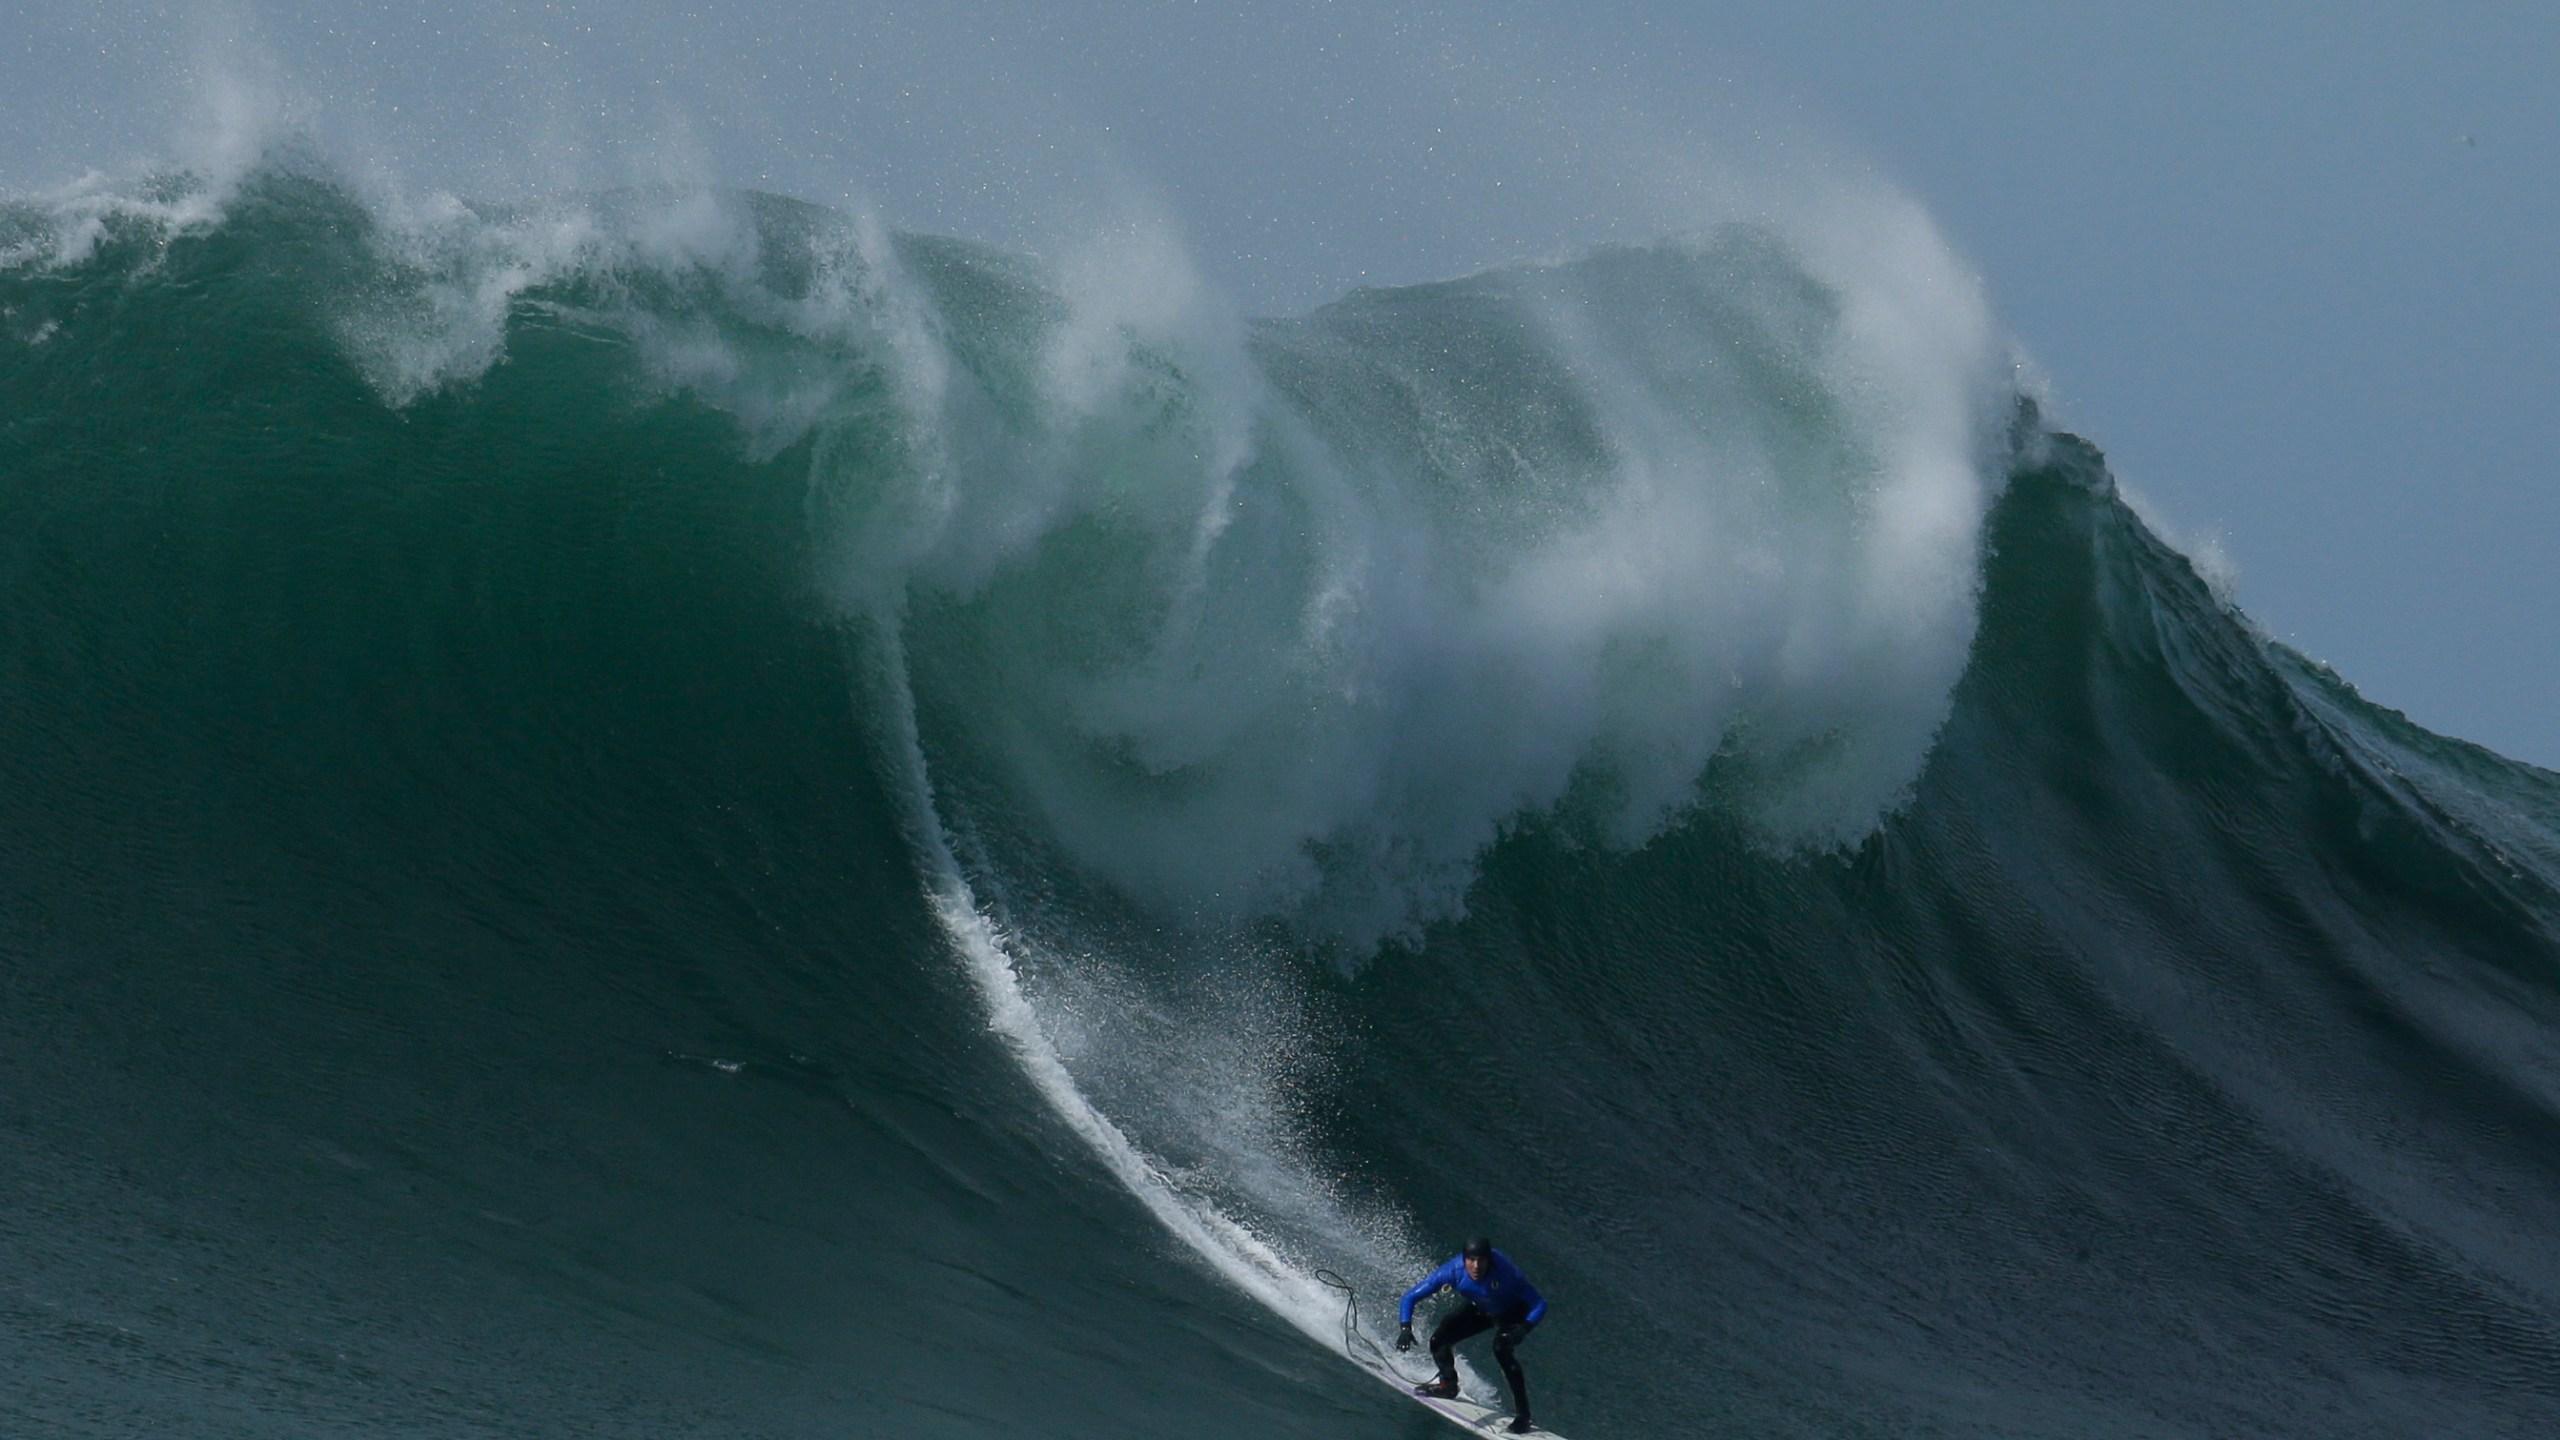 Surfing_Official_Sport_28412-159532.jpg45497719